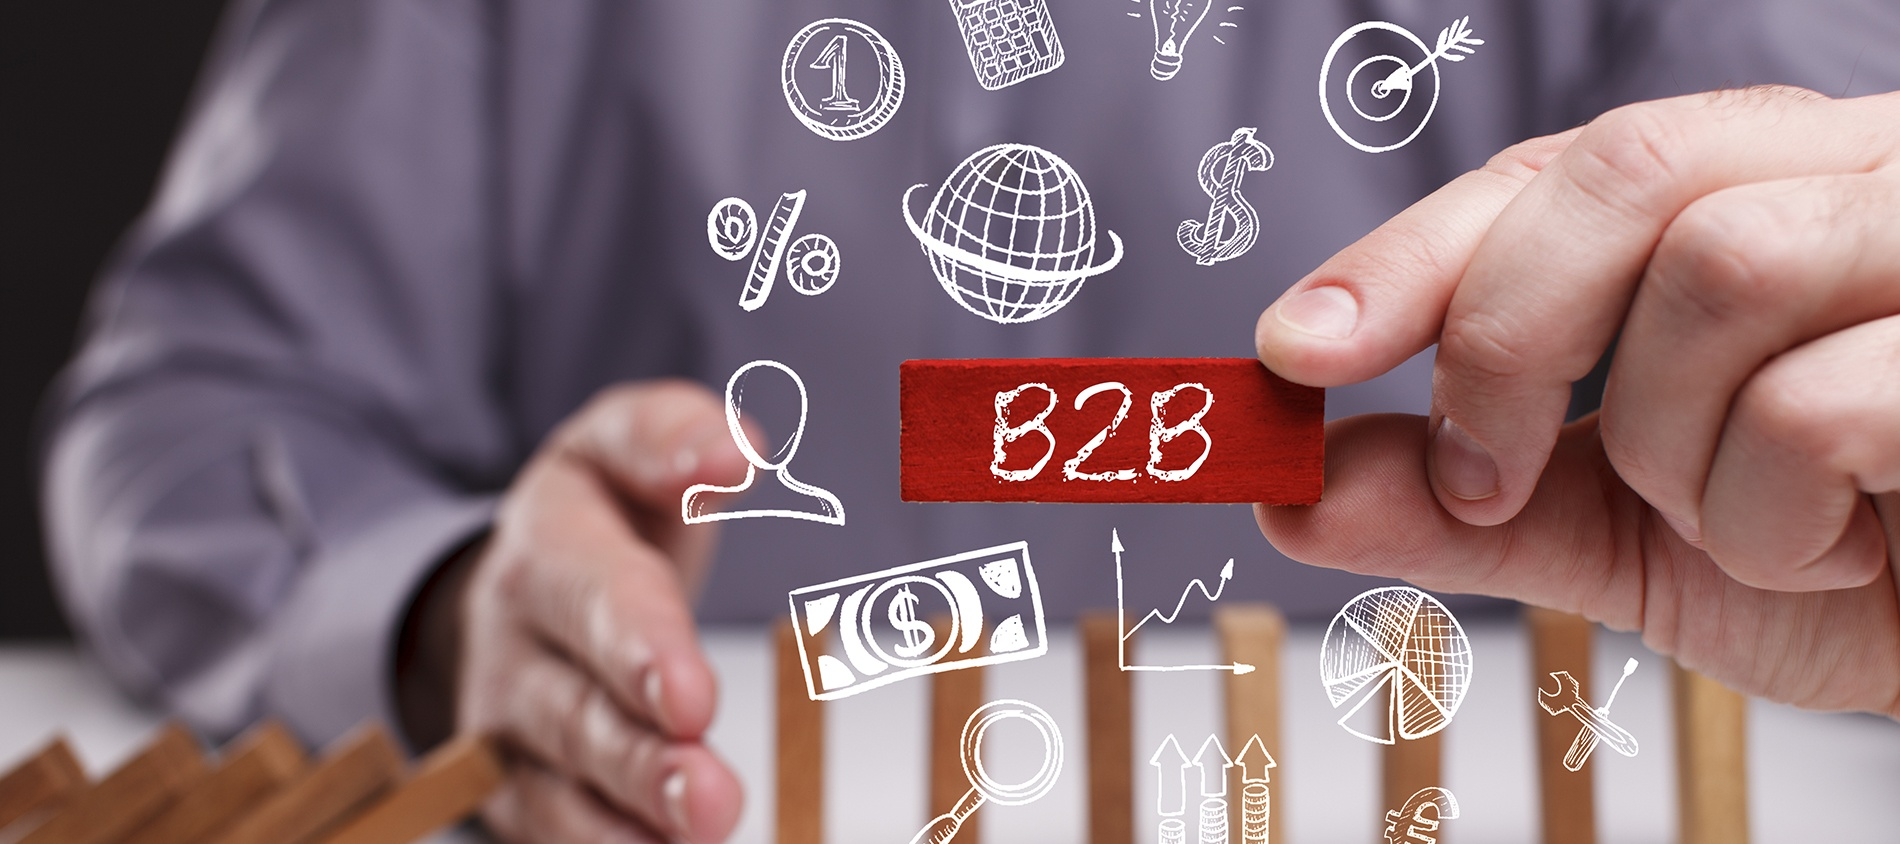 Estrategia de marketing para generar leads B2B